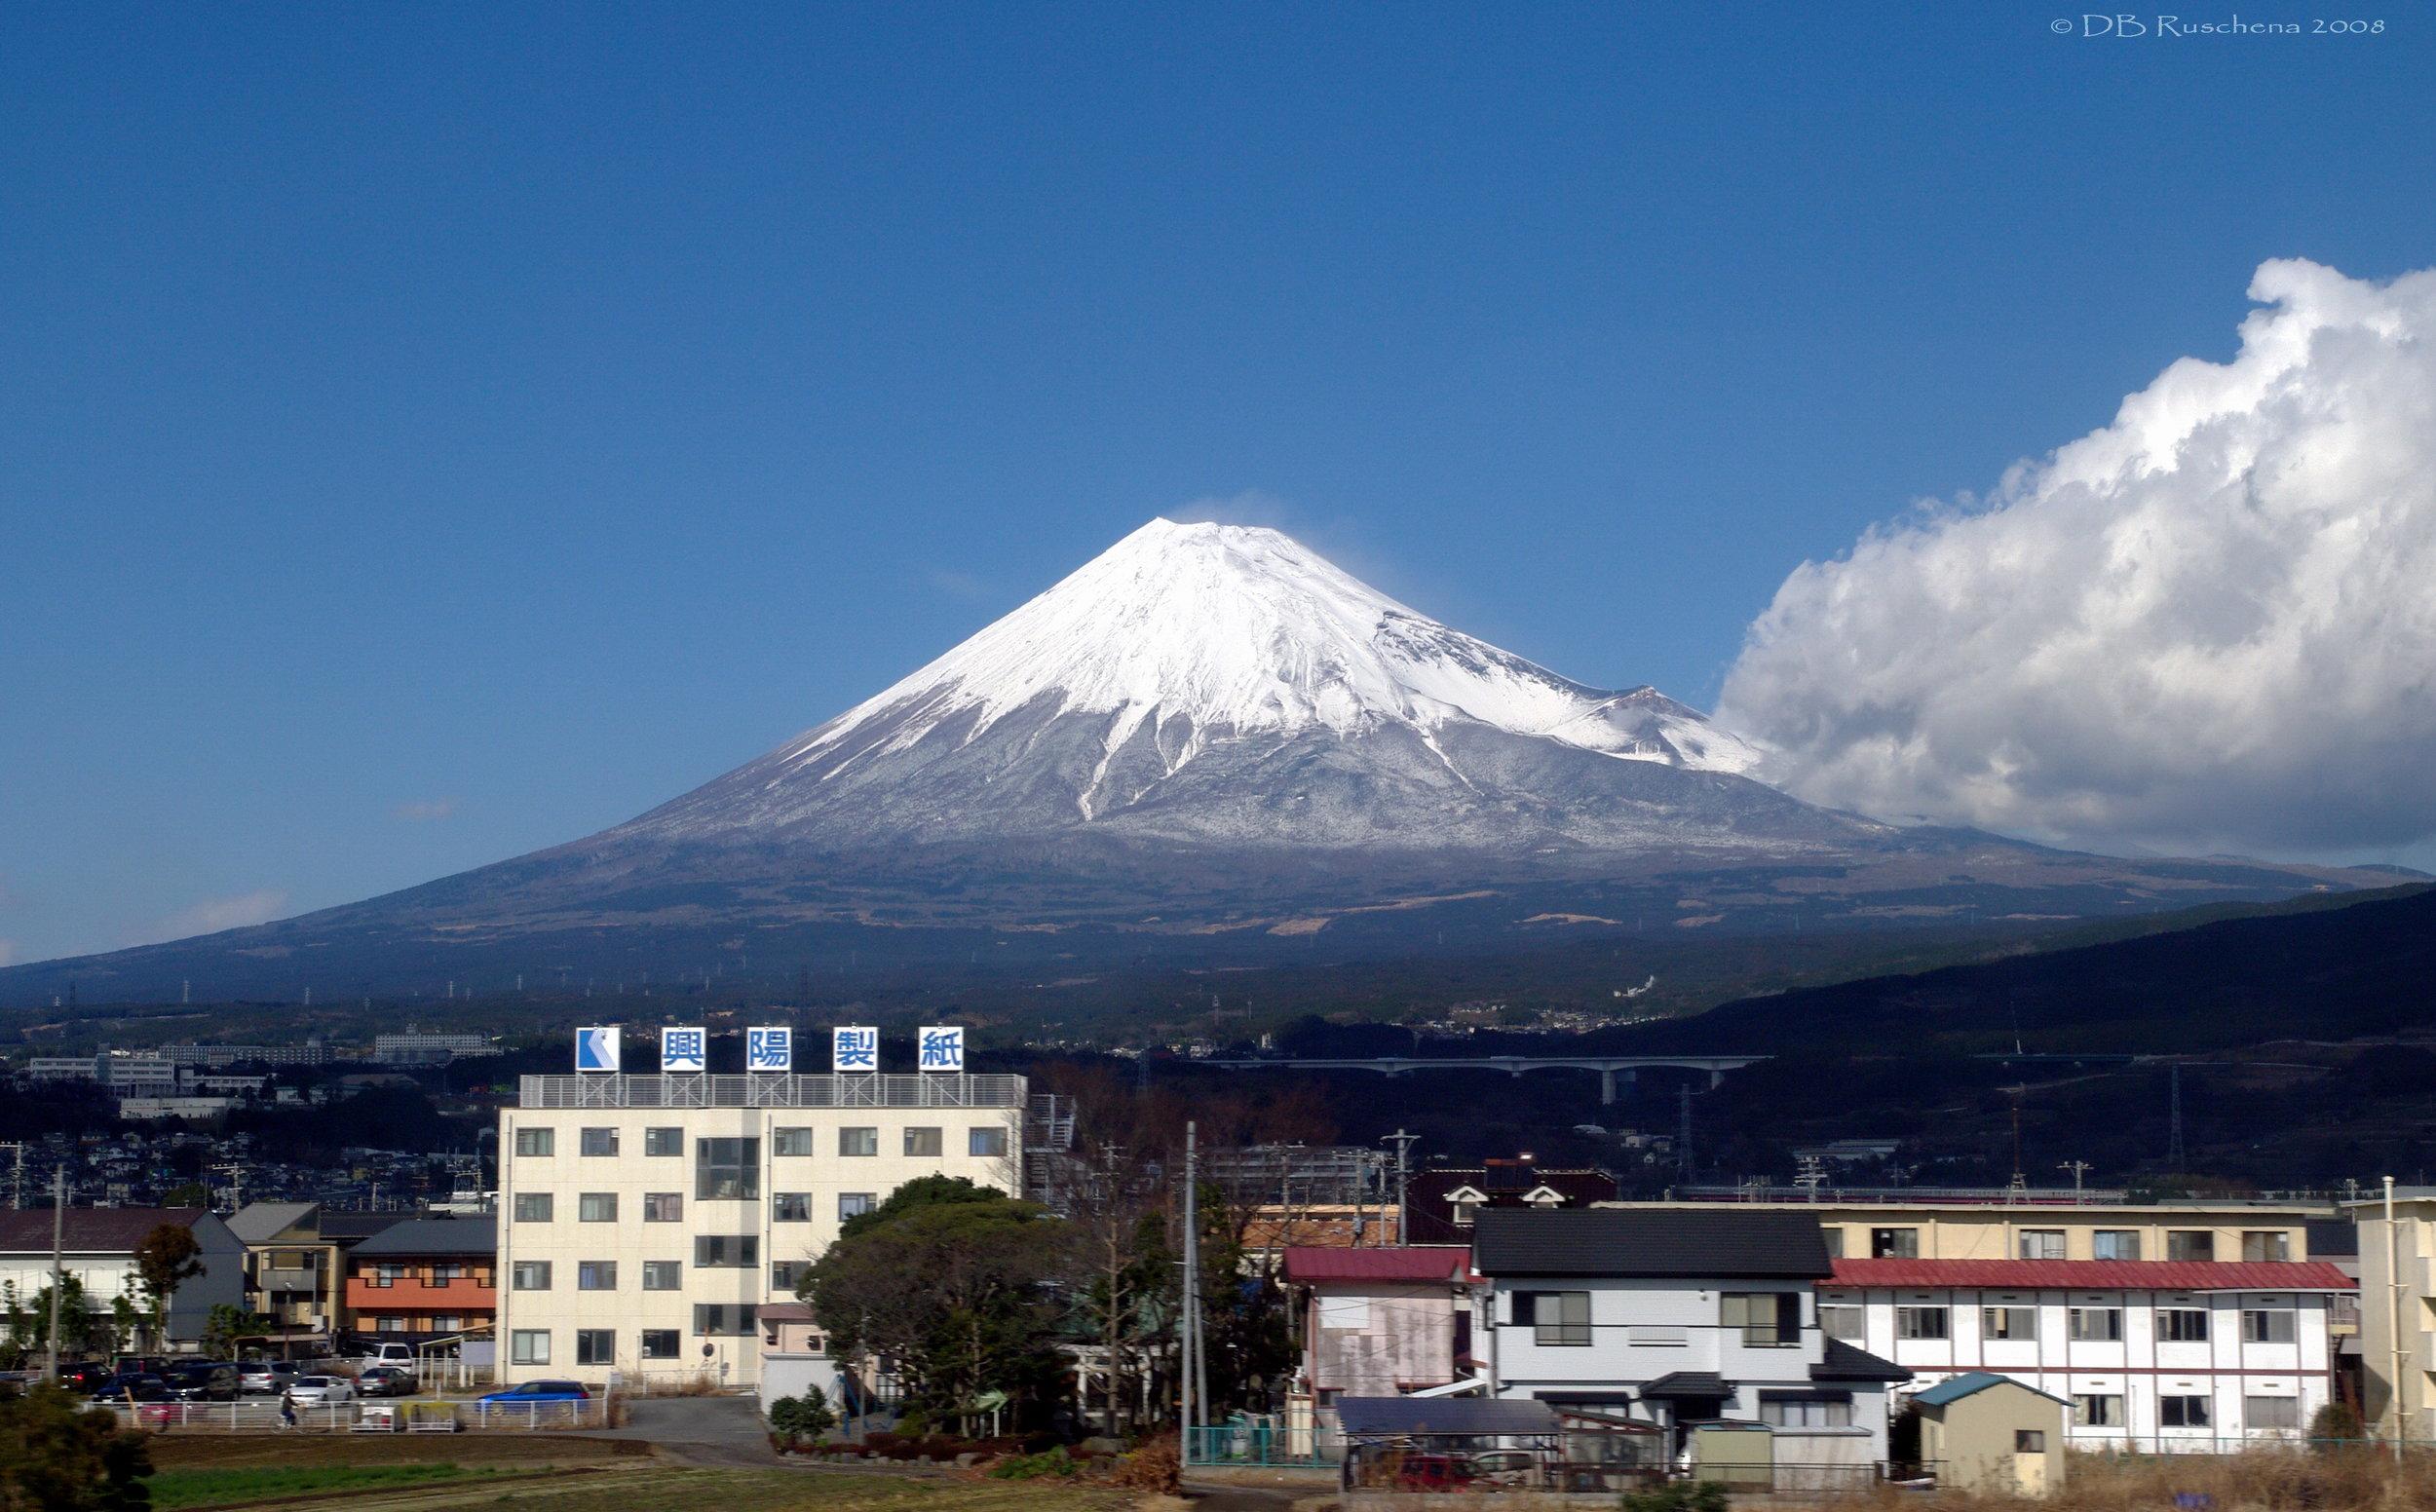 Industrial Fuji en route to Tokyo